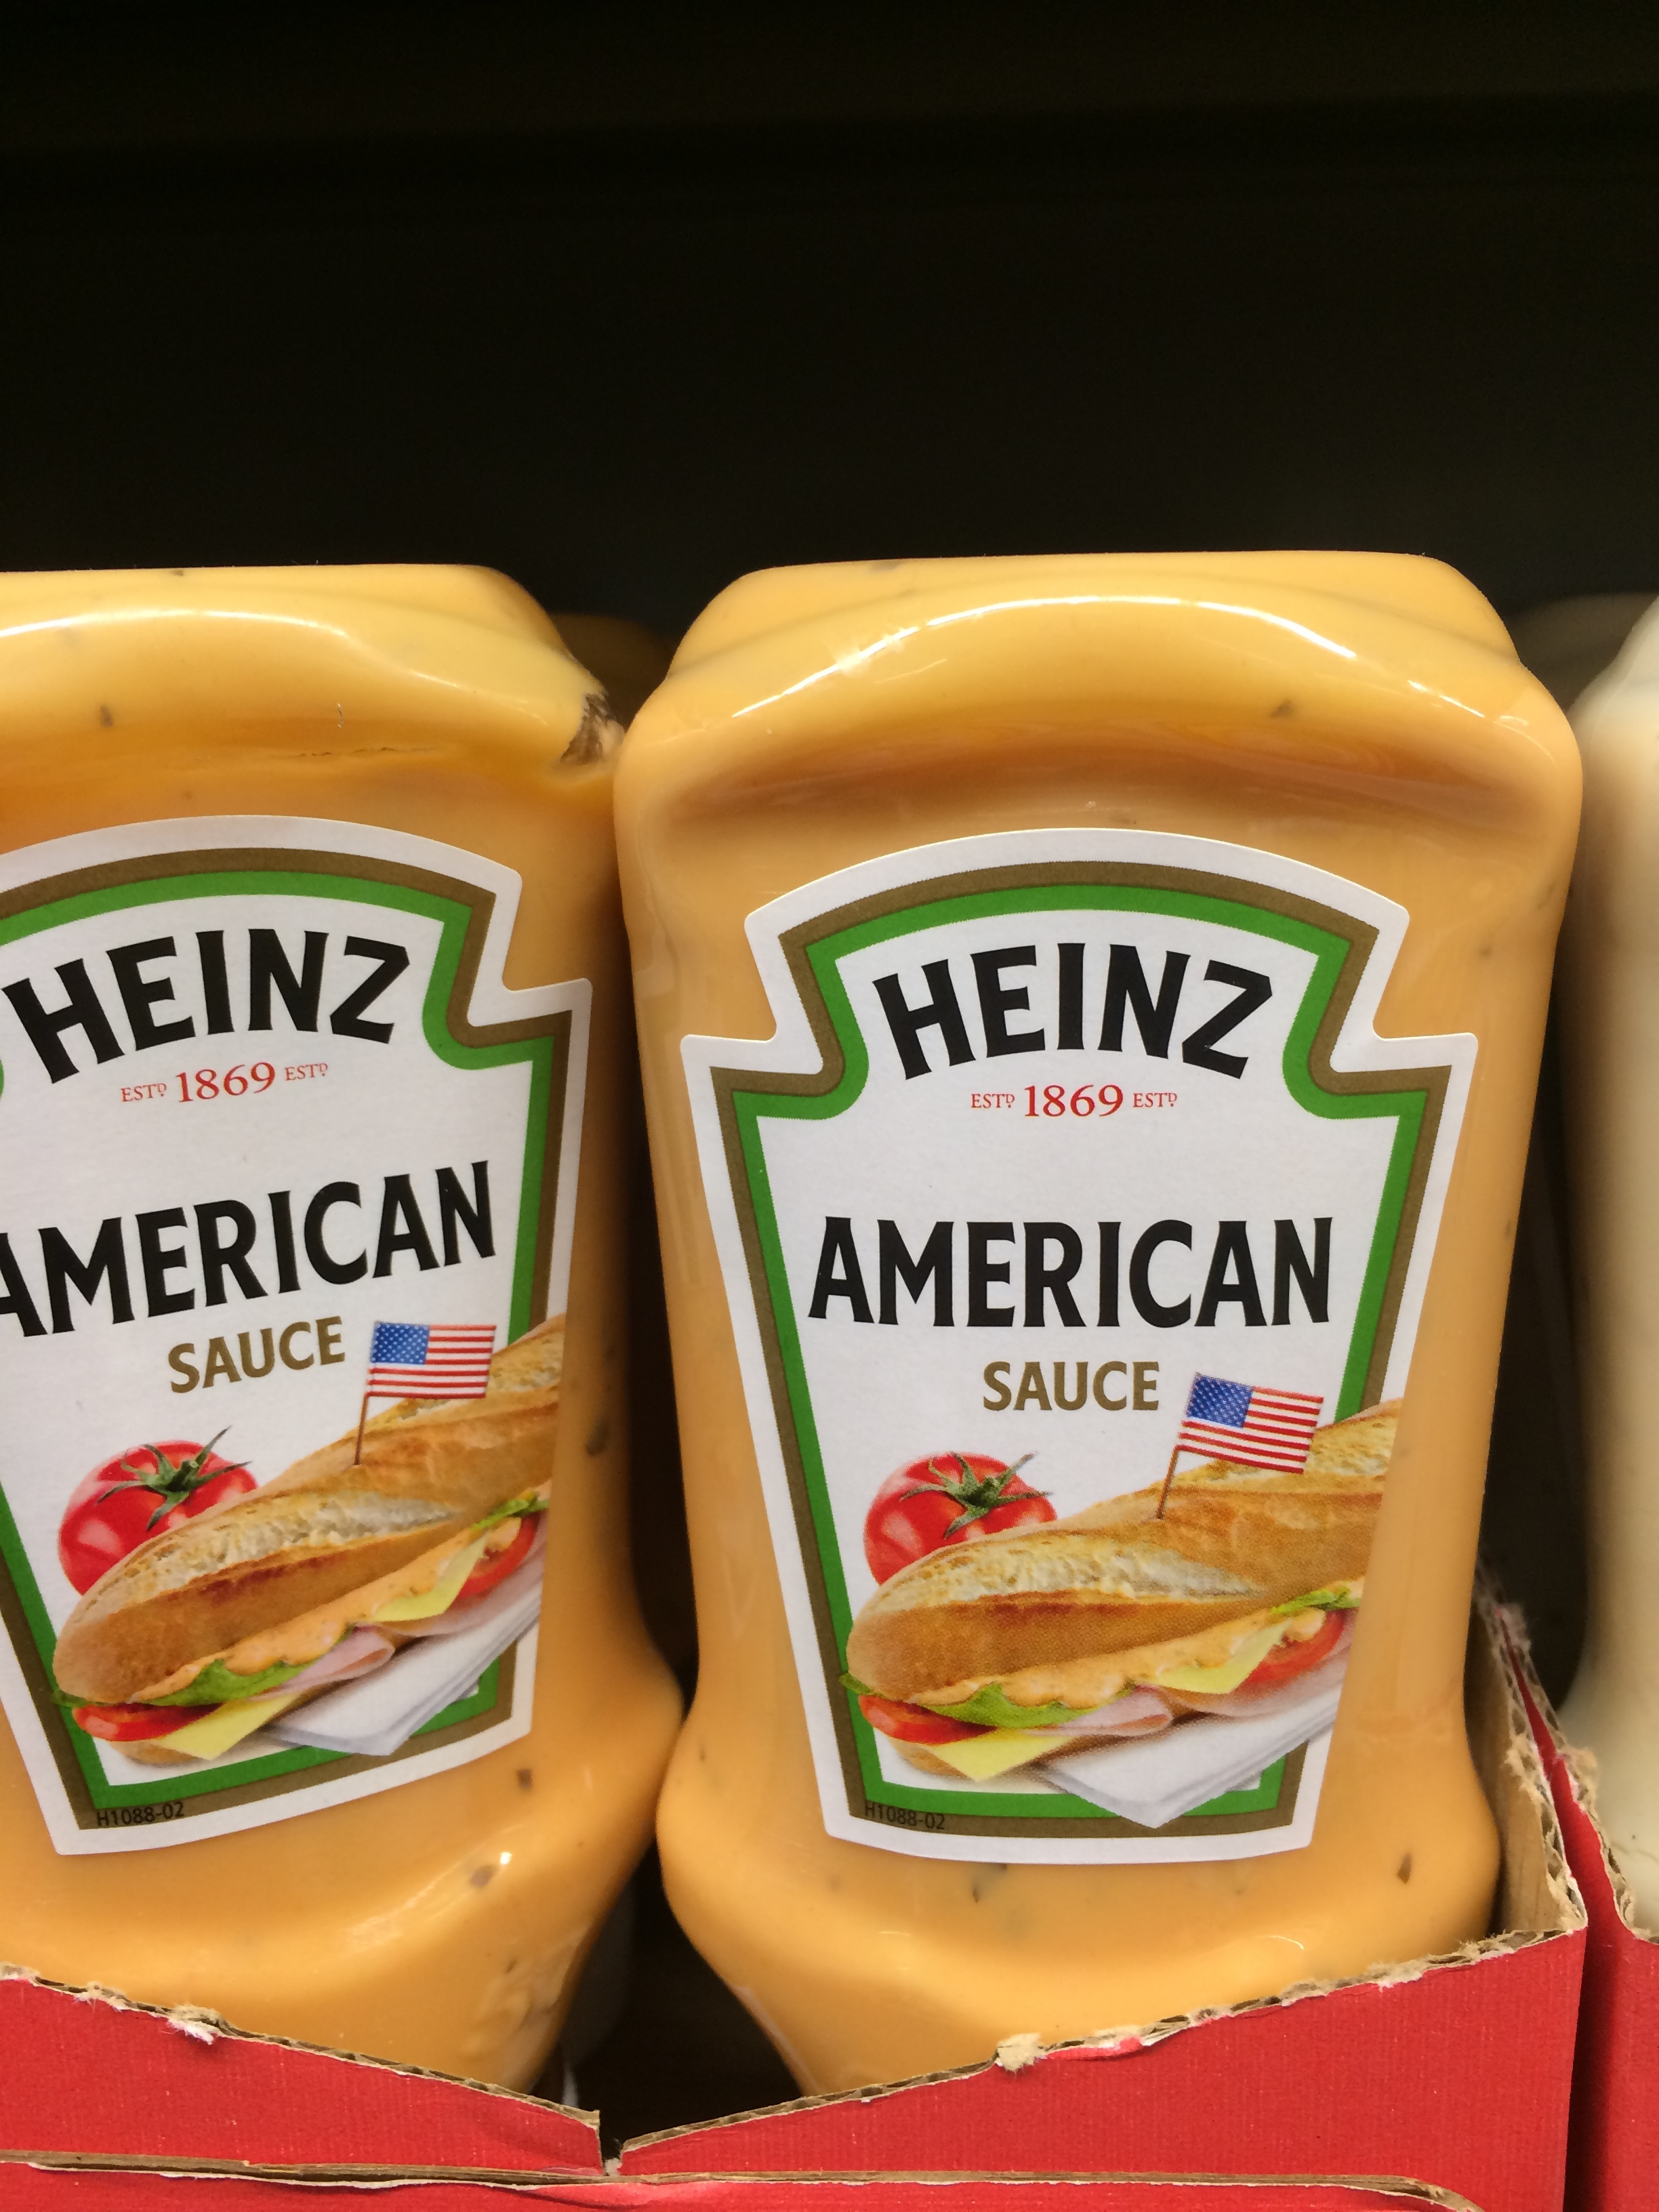 The American Sauce